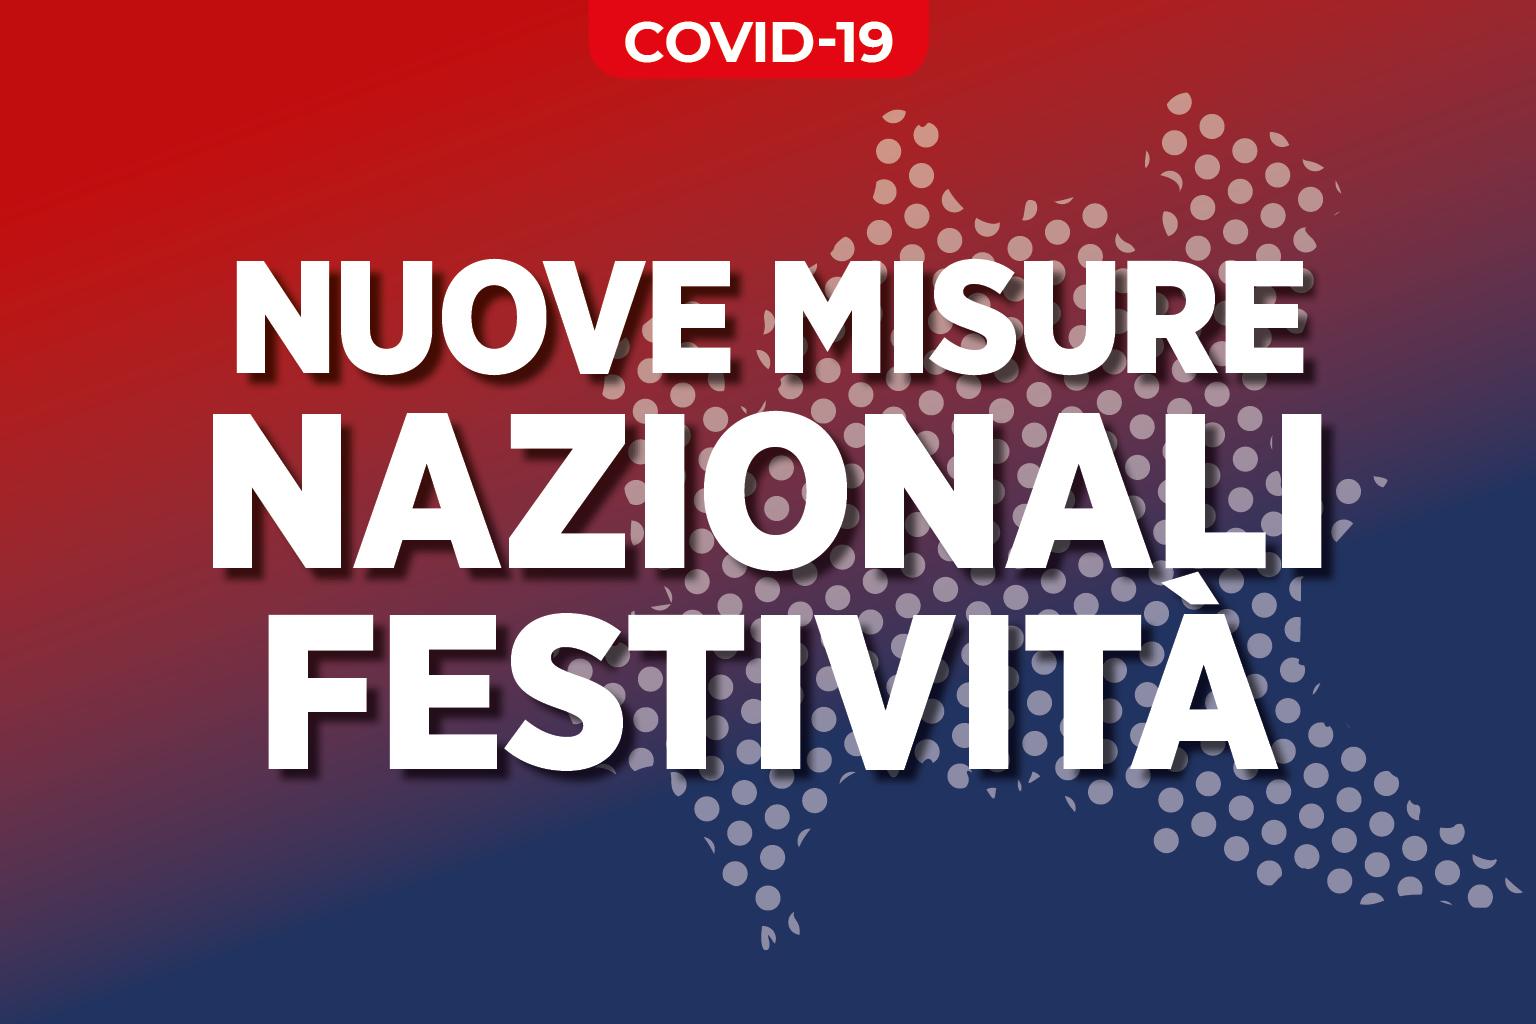 1536x1024 MISUREVALIDE FESTIVITa